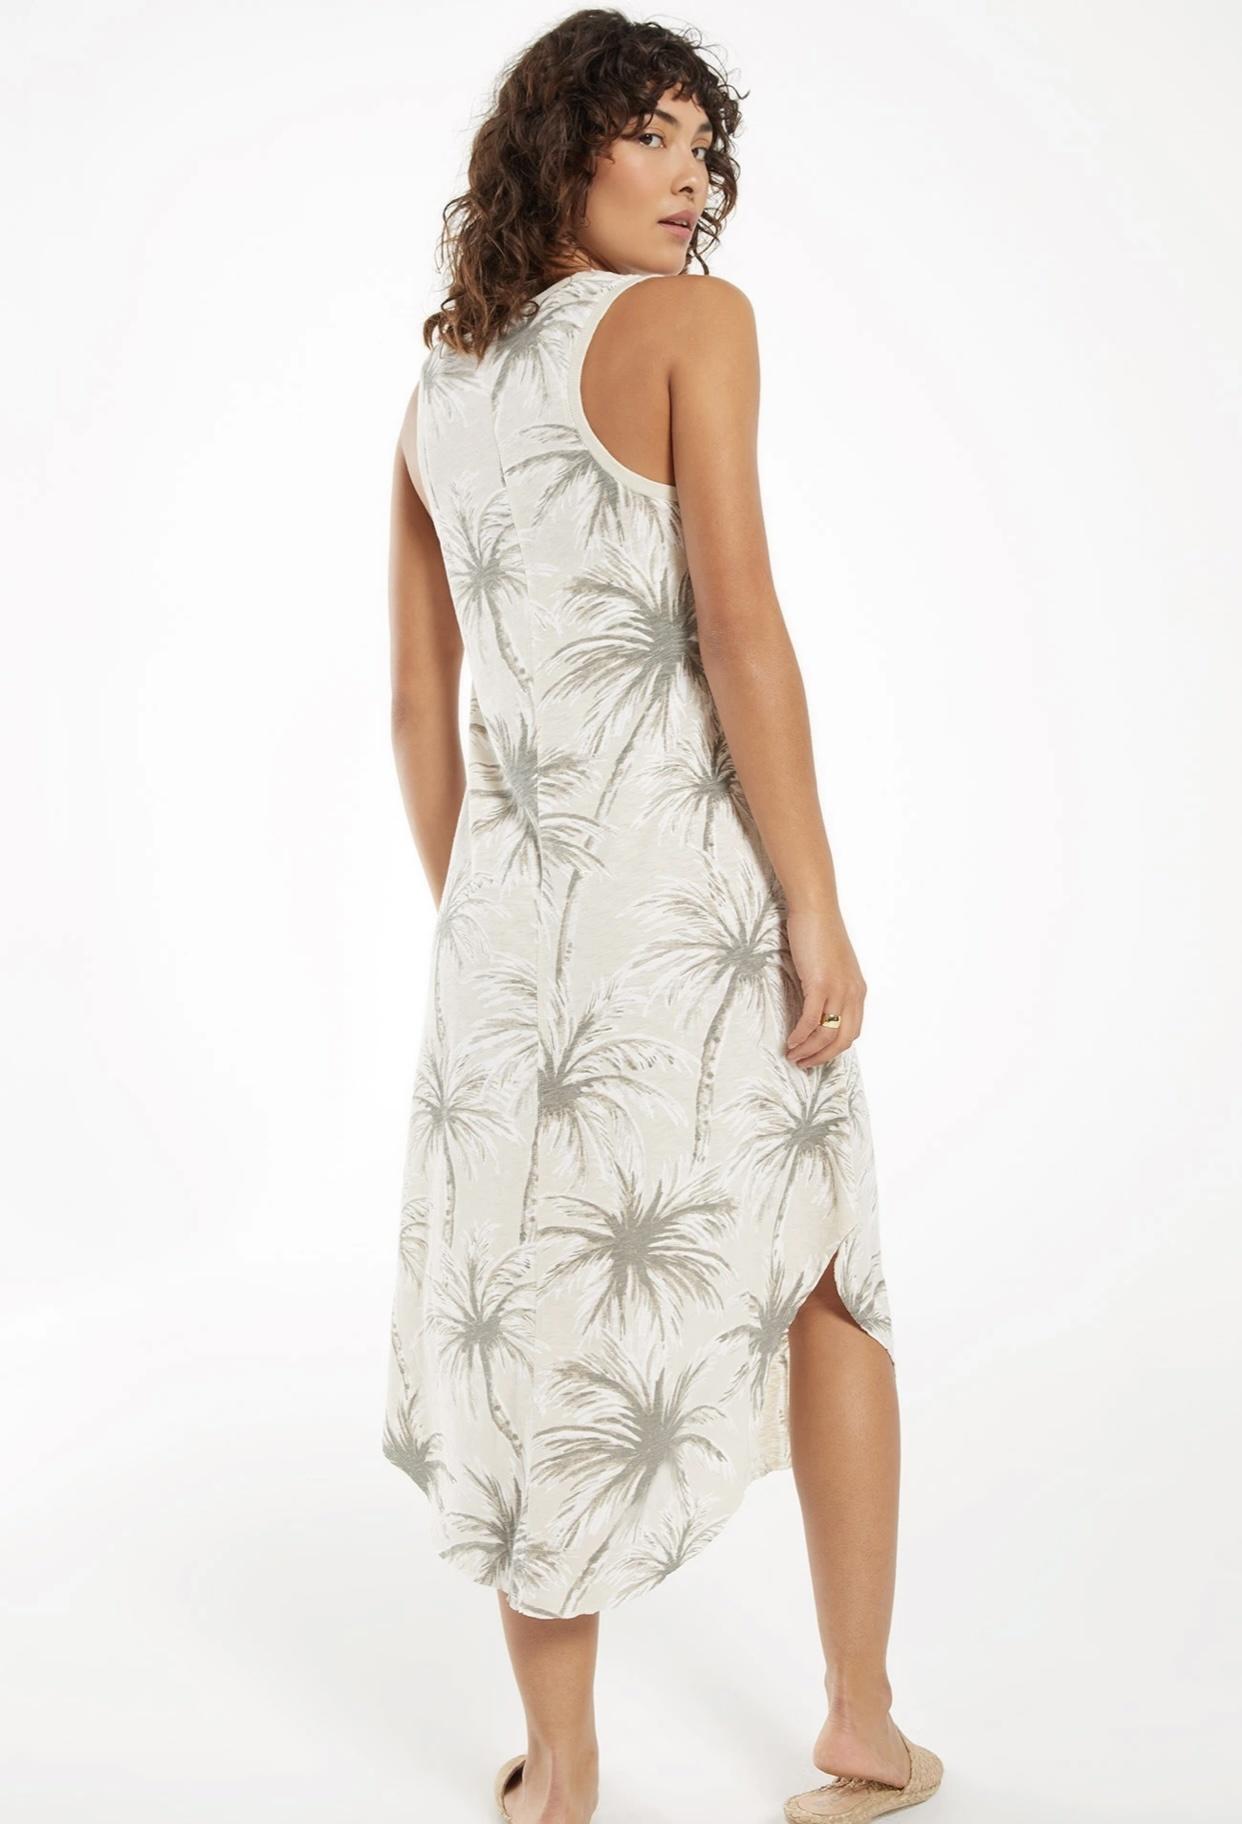 Reverie Coconut Palm Dress